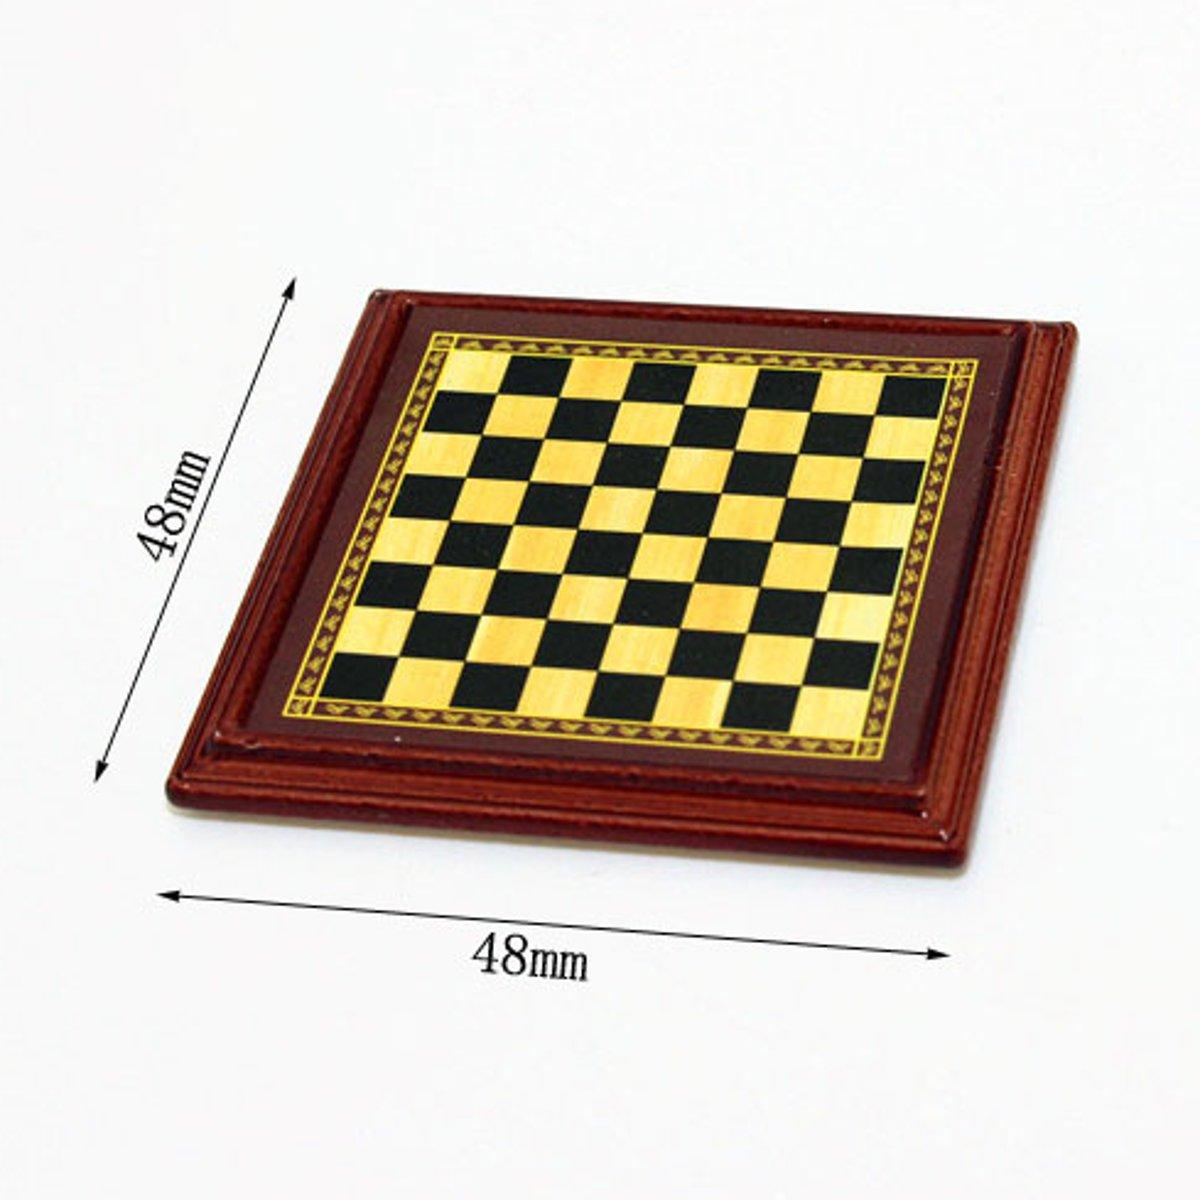 1/6 scale chess set 46CF03C79AC86373C72AD2C9669B26D273CC05CB9AD2CE9B03CDD25E9D169C93939303C71ACC999963F5CD